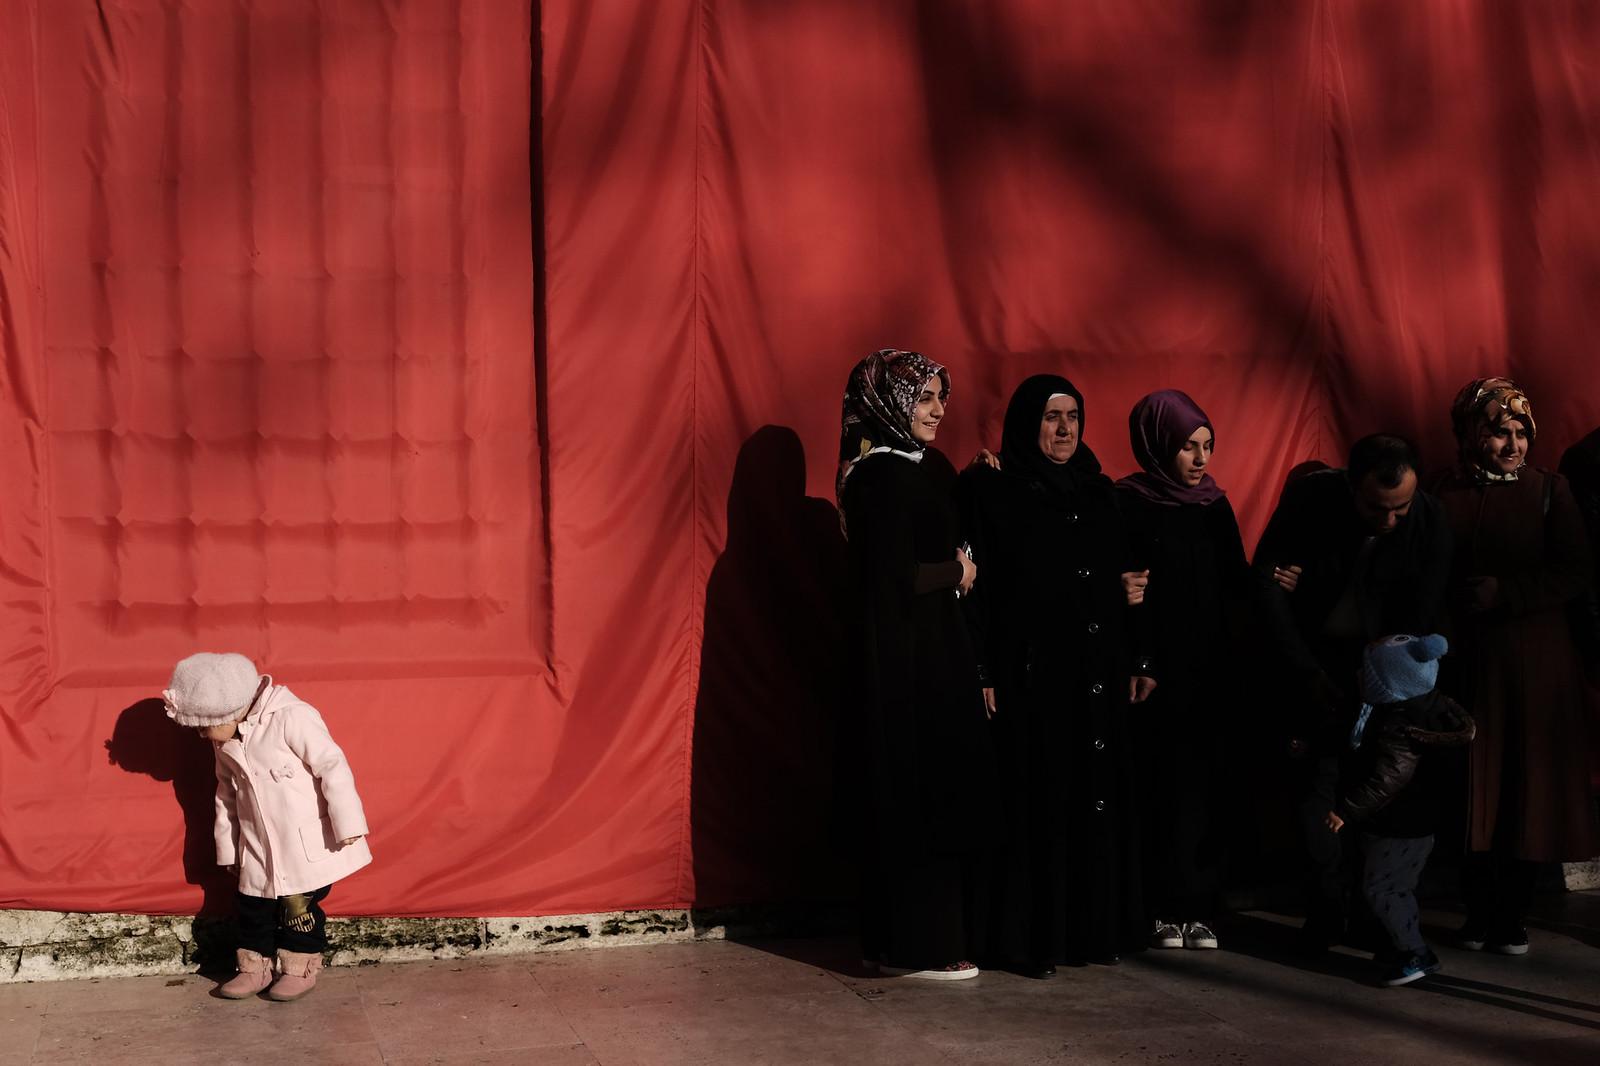 red | by Ufuk Akarı (TURKUAZSTREET)